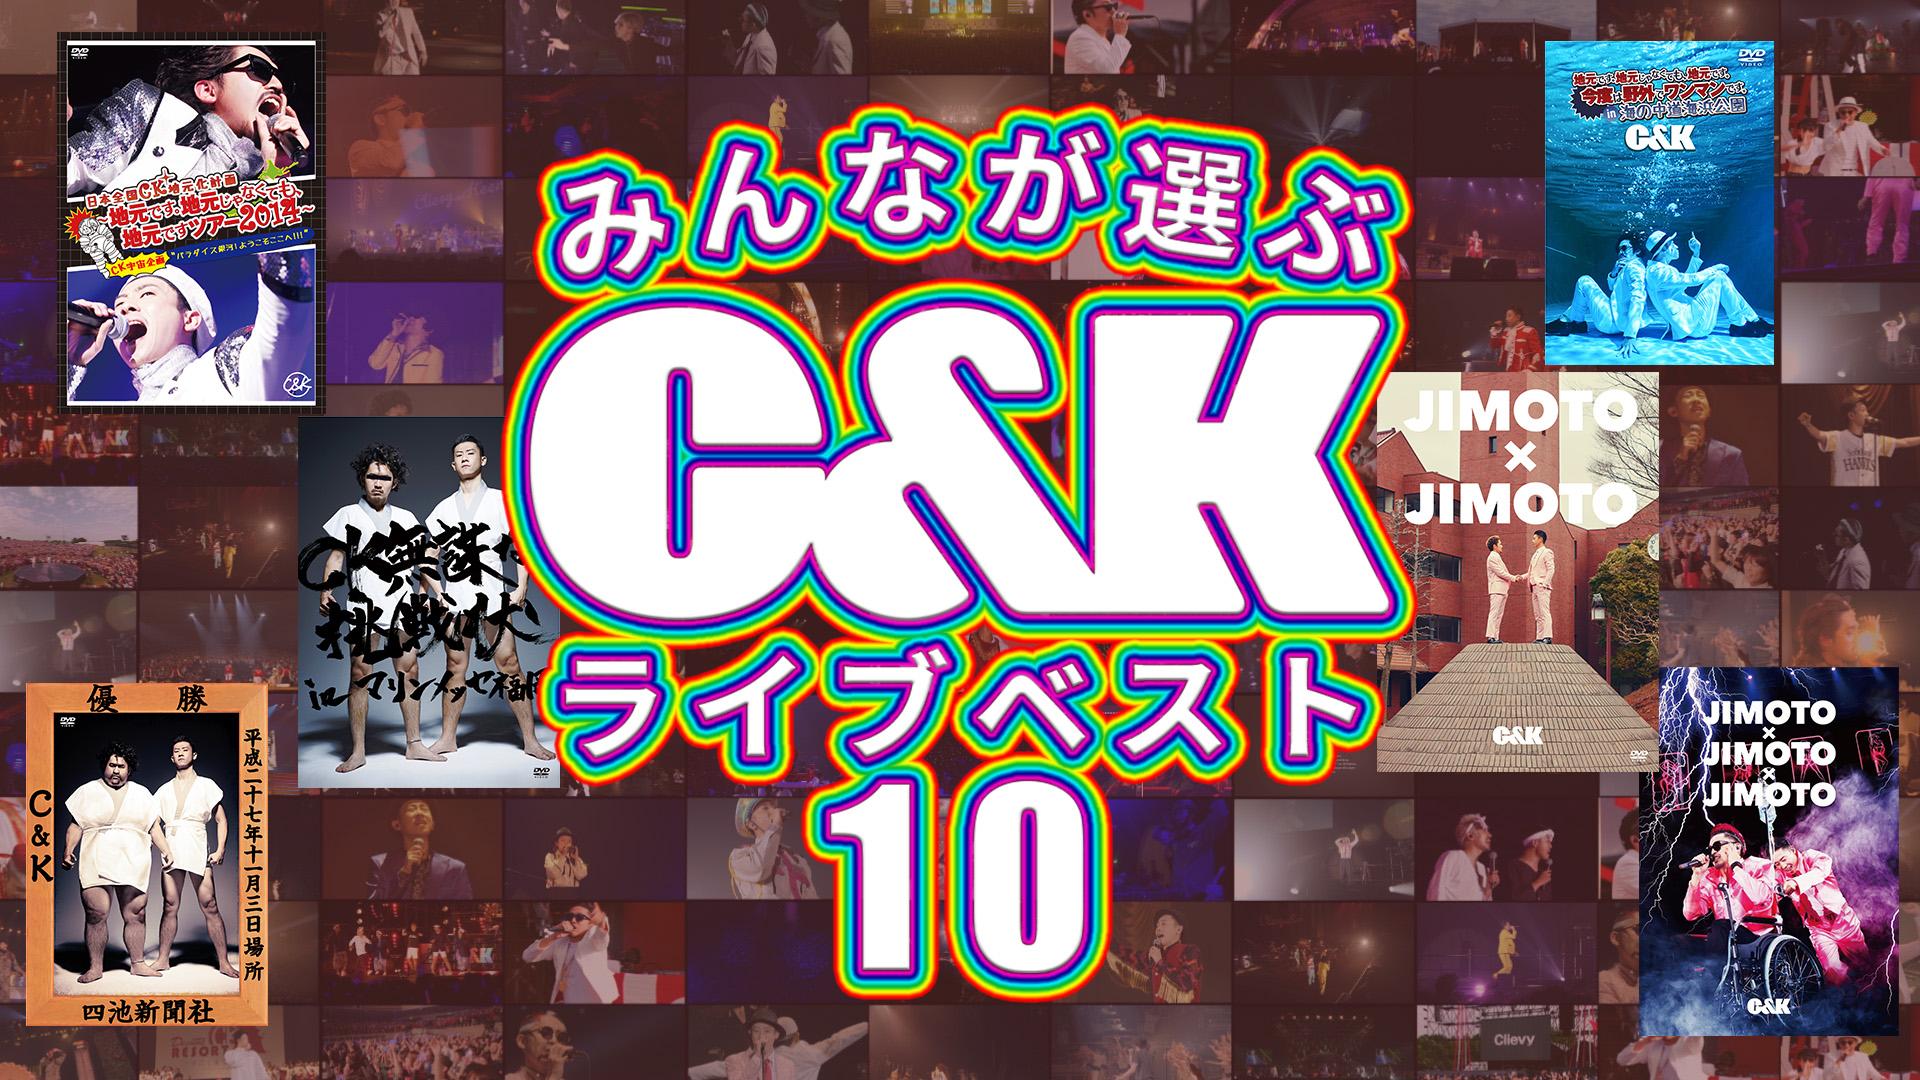 C&K、ライブ映像のベスト版「みんなが選ぶC&Kライブベスト10」YouTubeプレミア公開にて発表